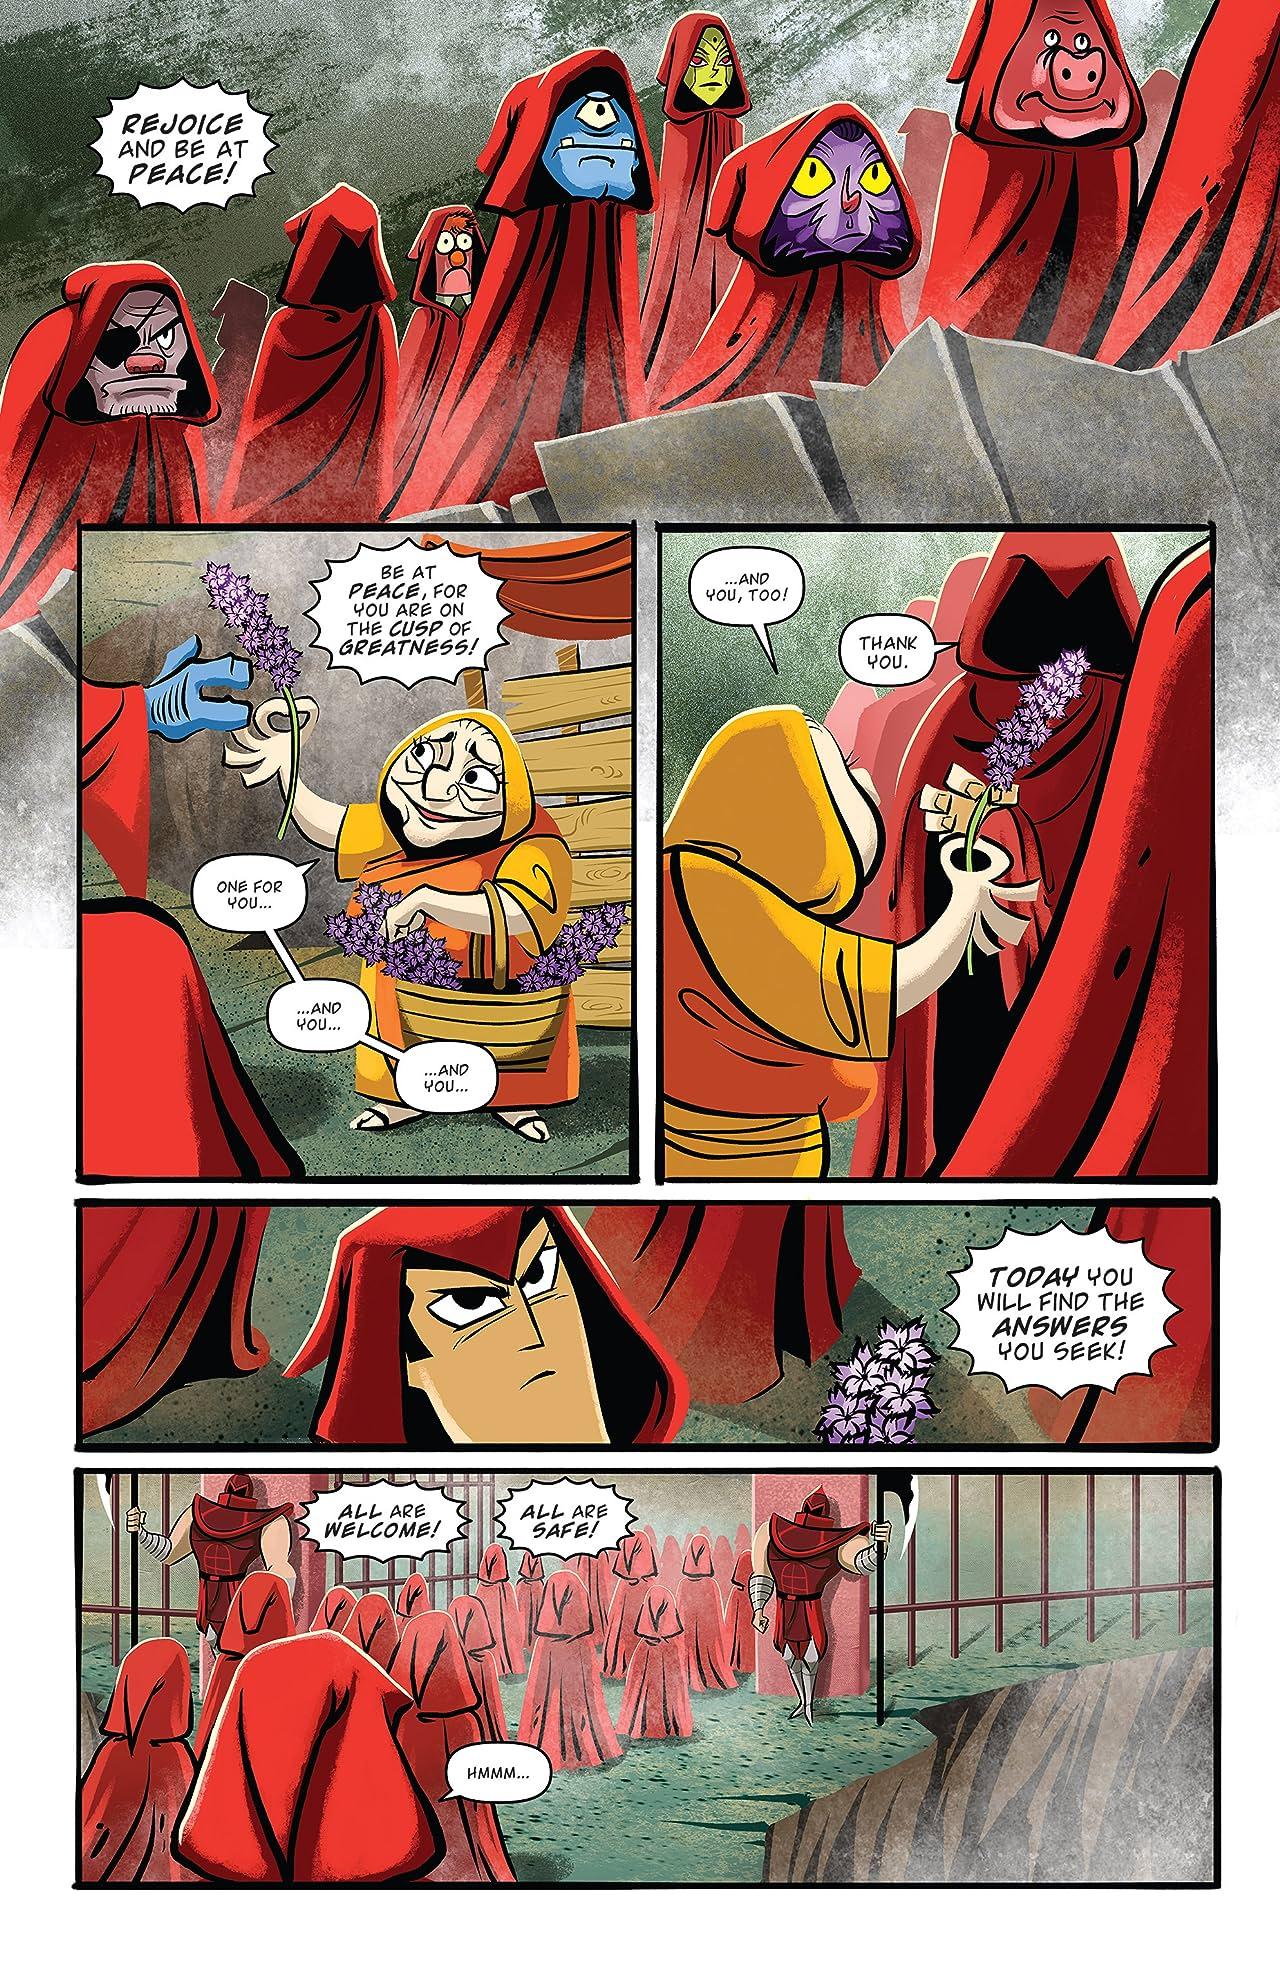 Samurai Jack Vol. 4: Warrior King